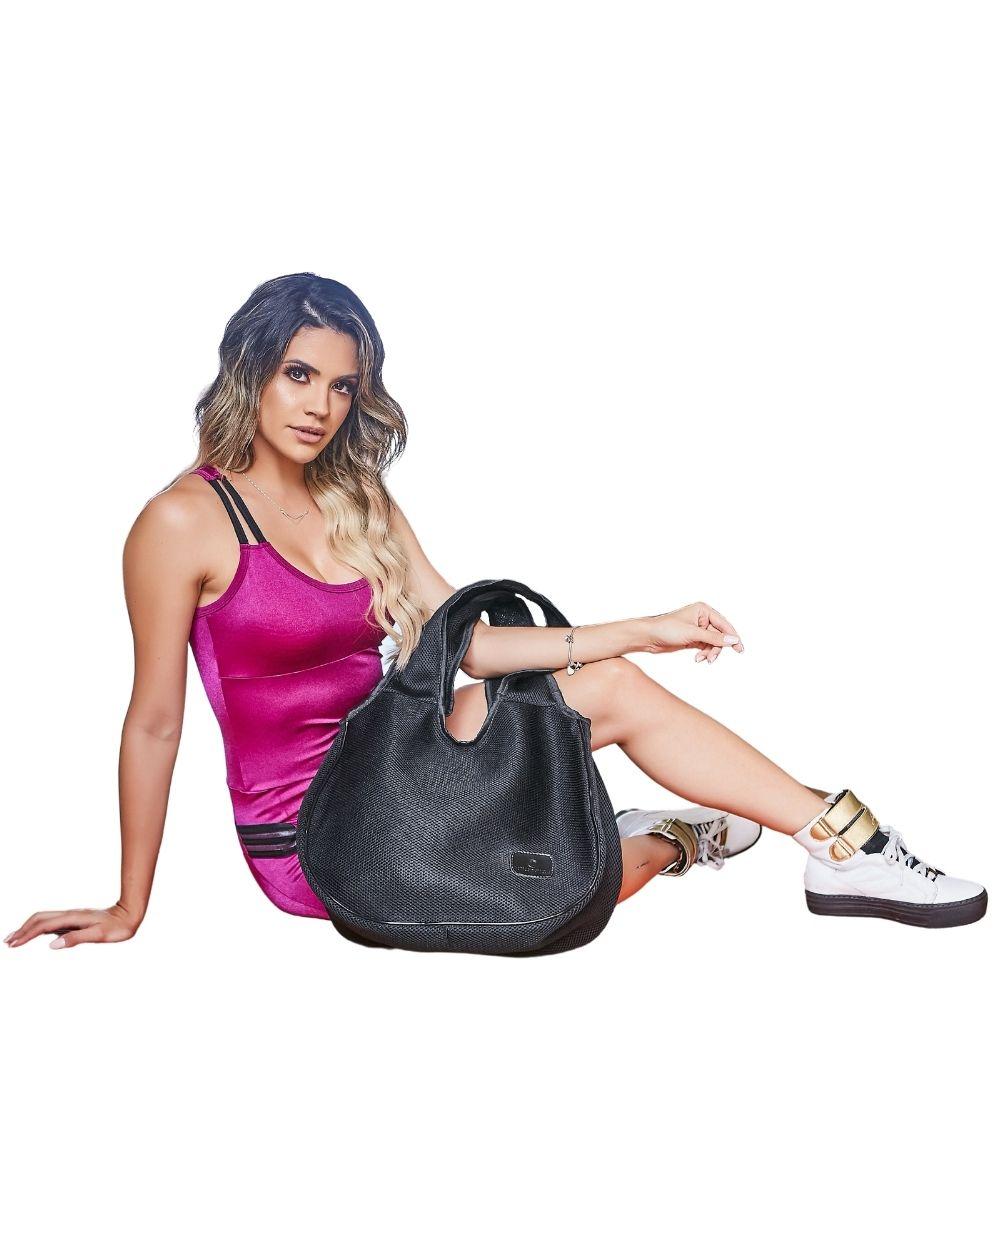 Bolsa Giselle Matteo Matteucci Fitness Preto